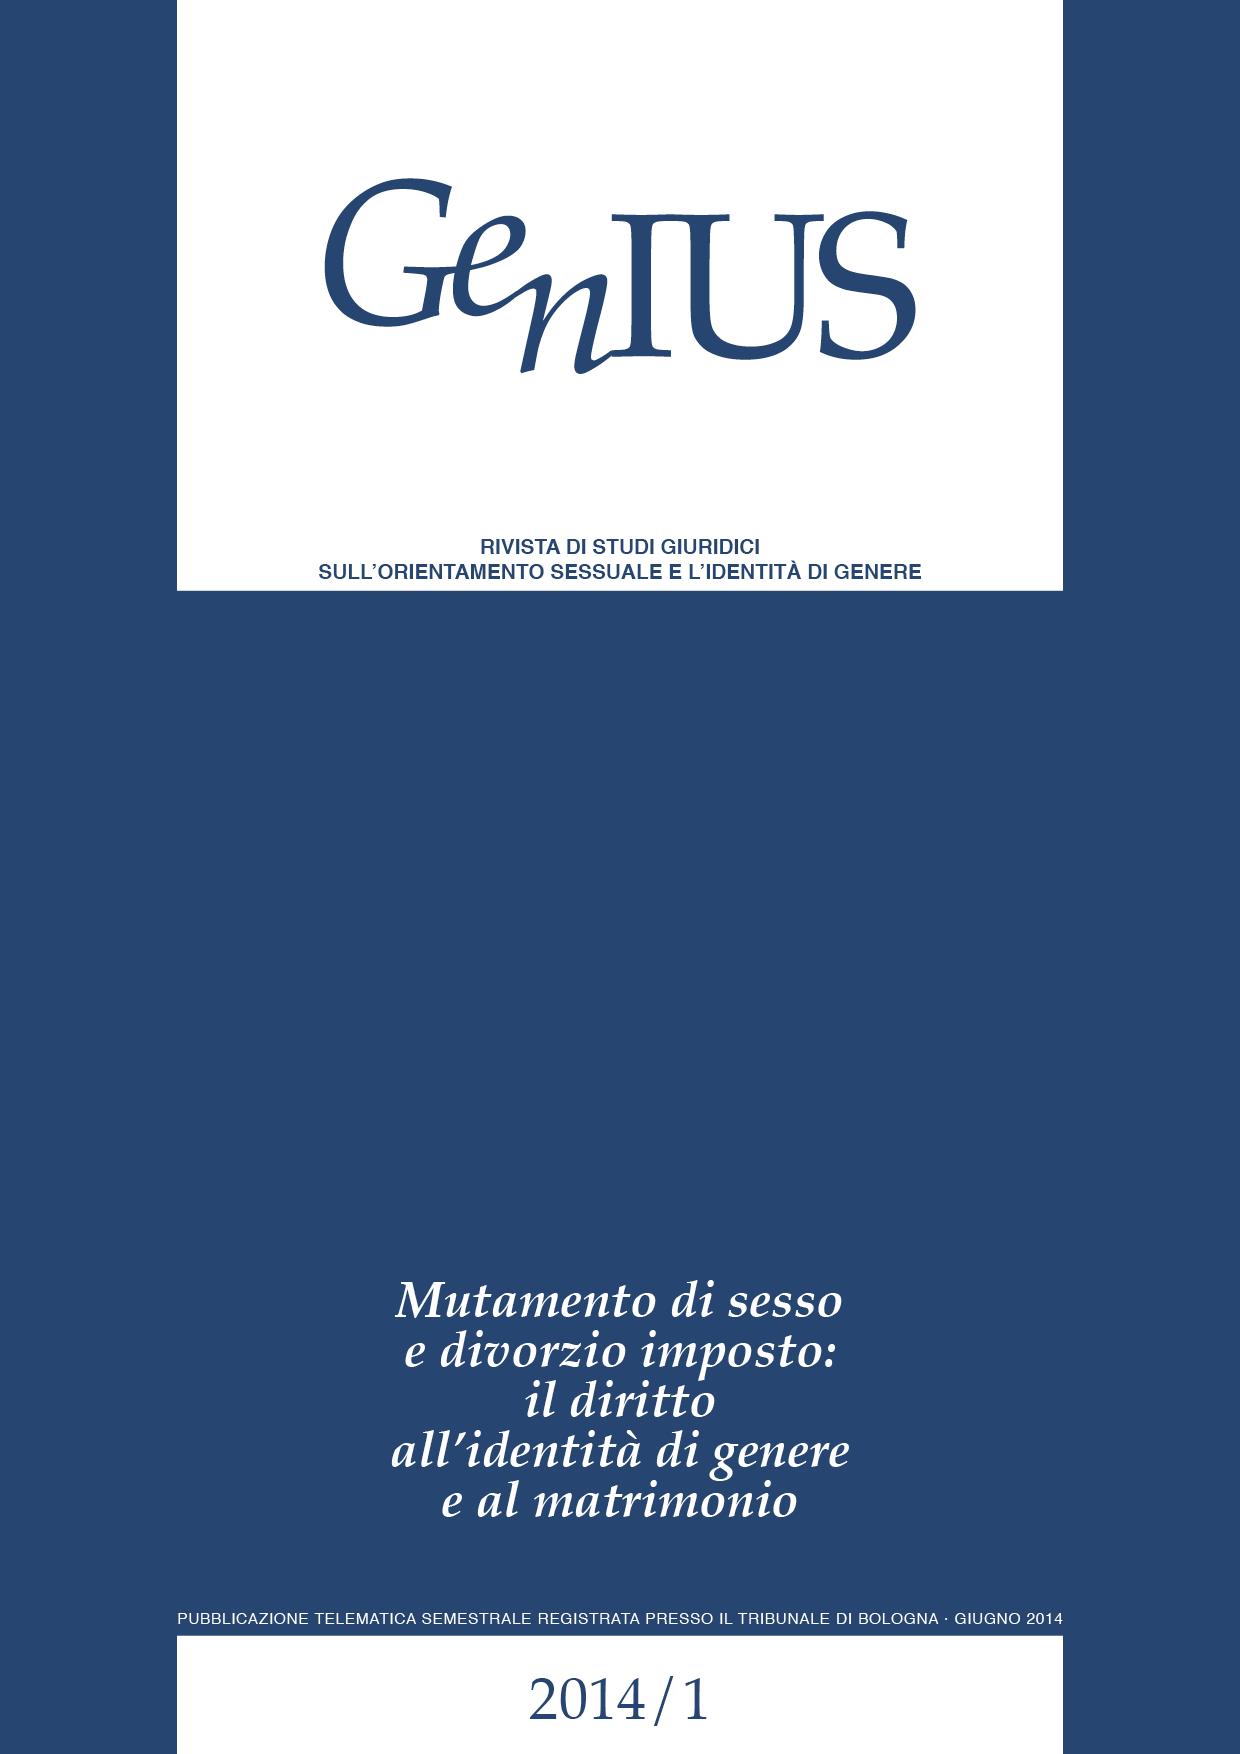 GenIUS 2014/01 - Giugno 2014